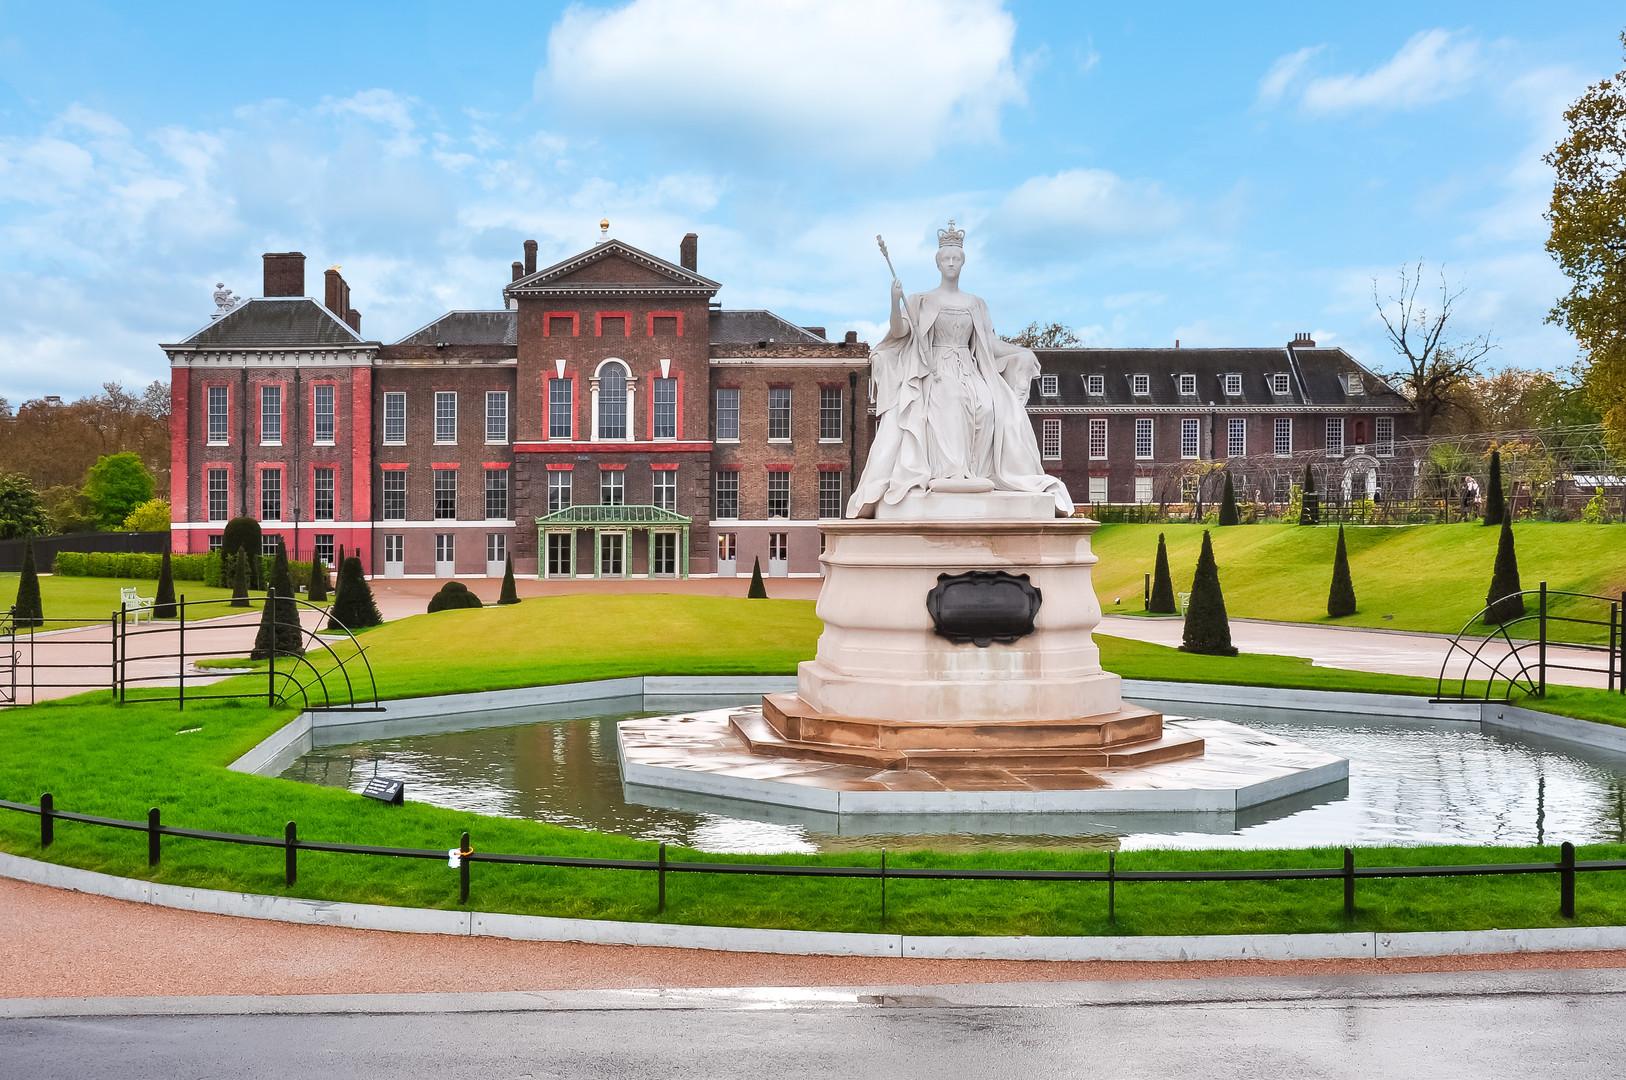 Kensington palace and Queen Victoria mon